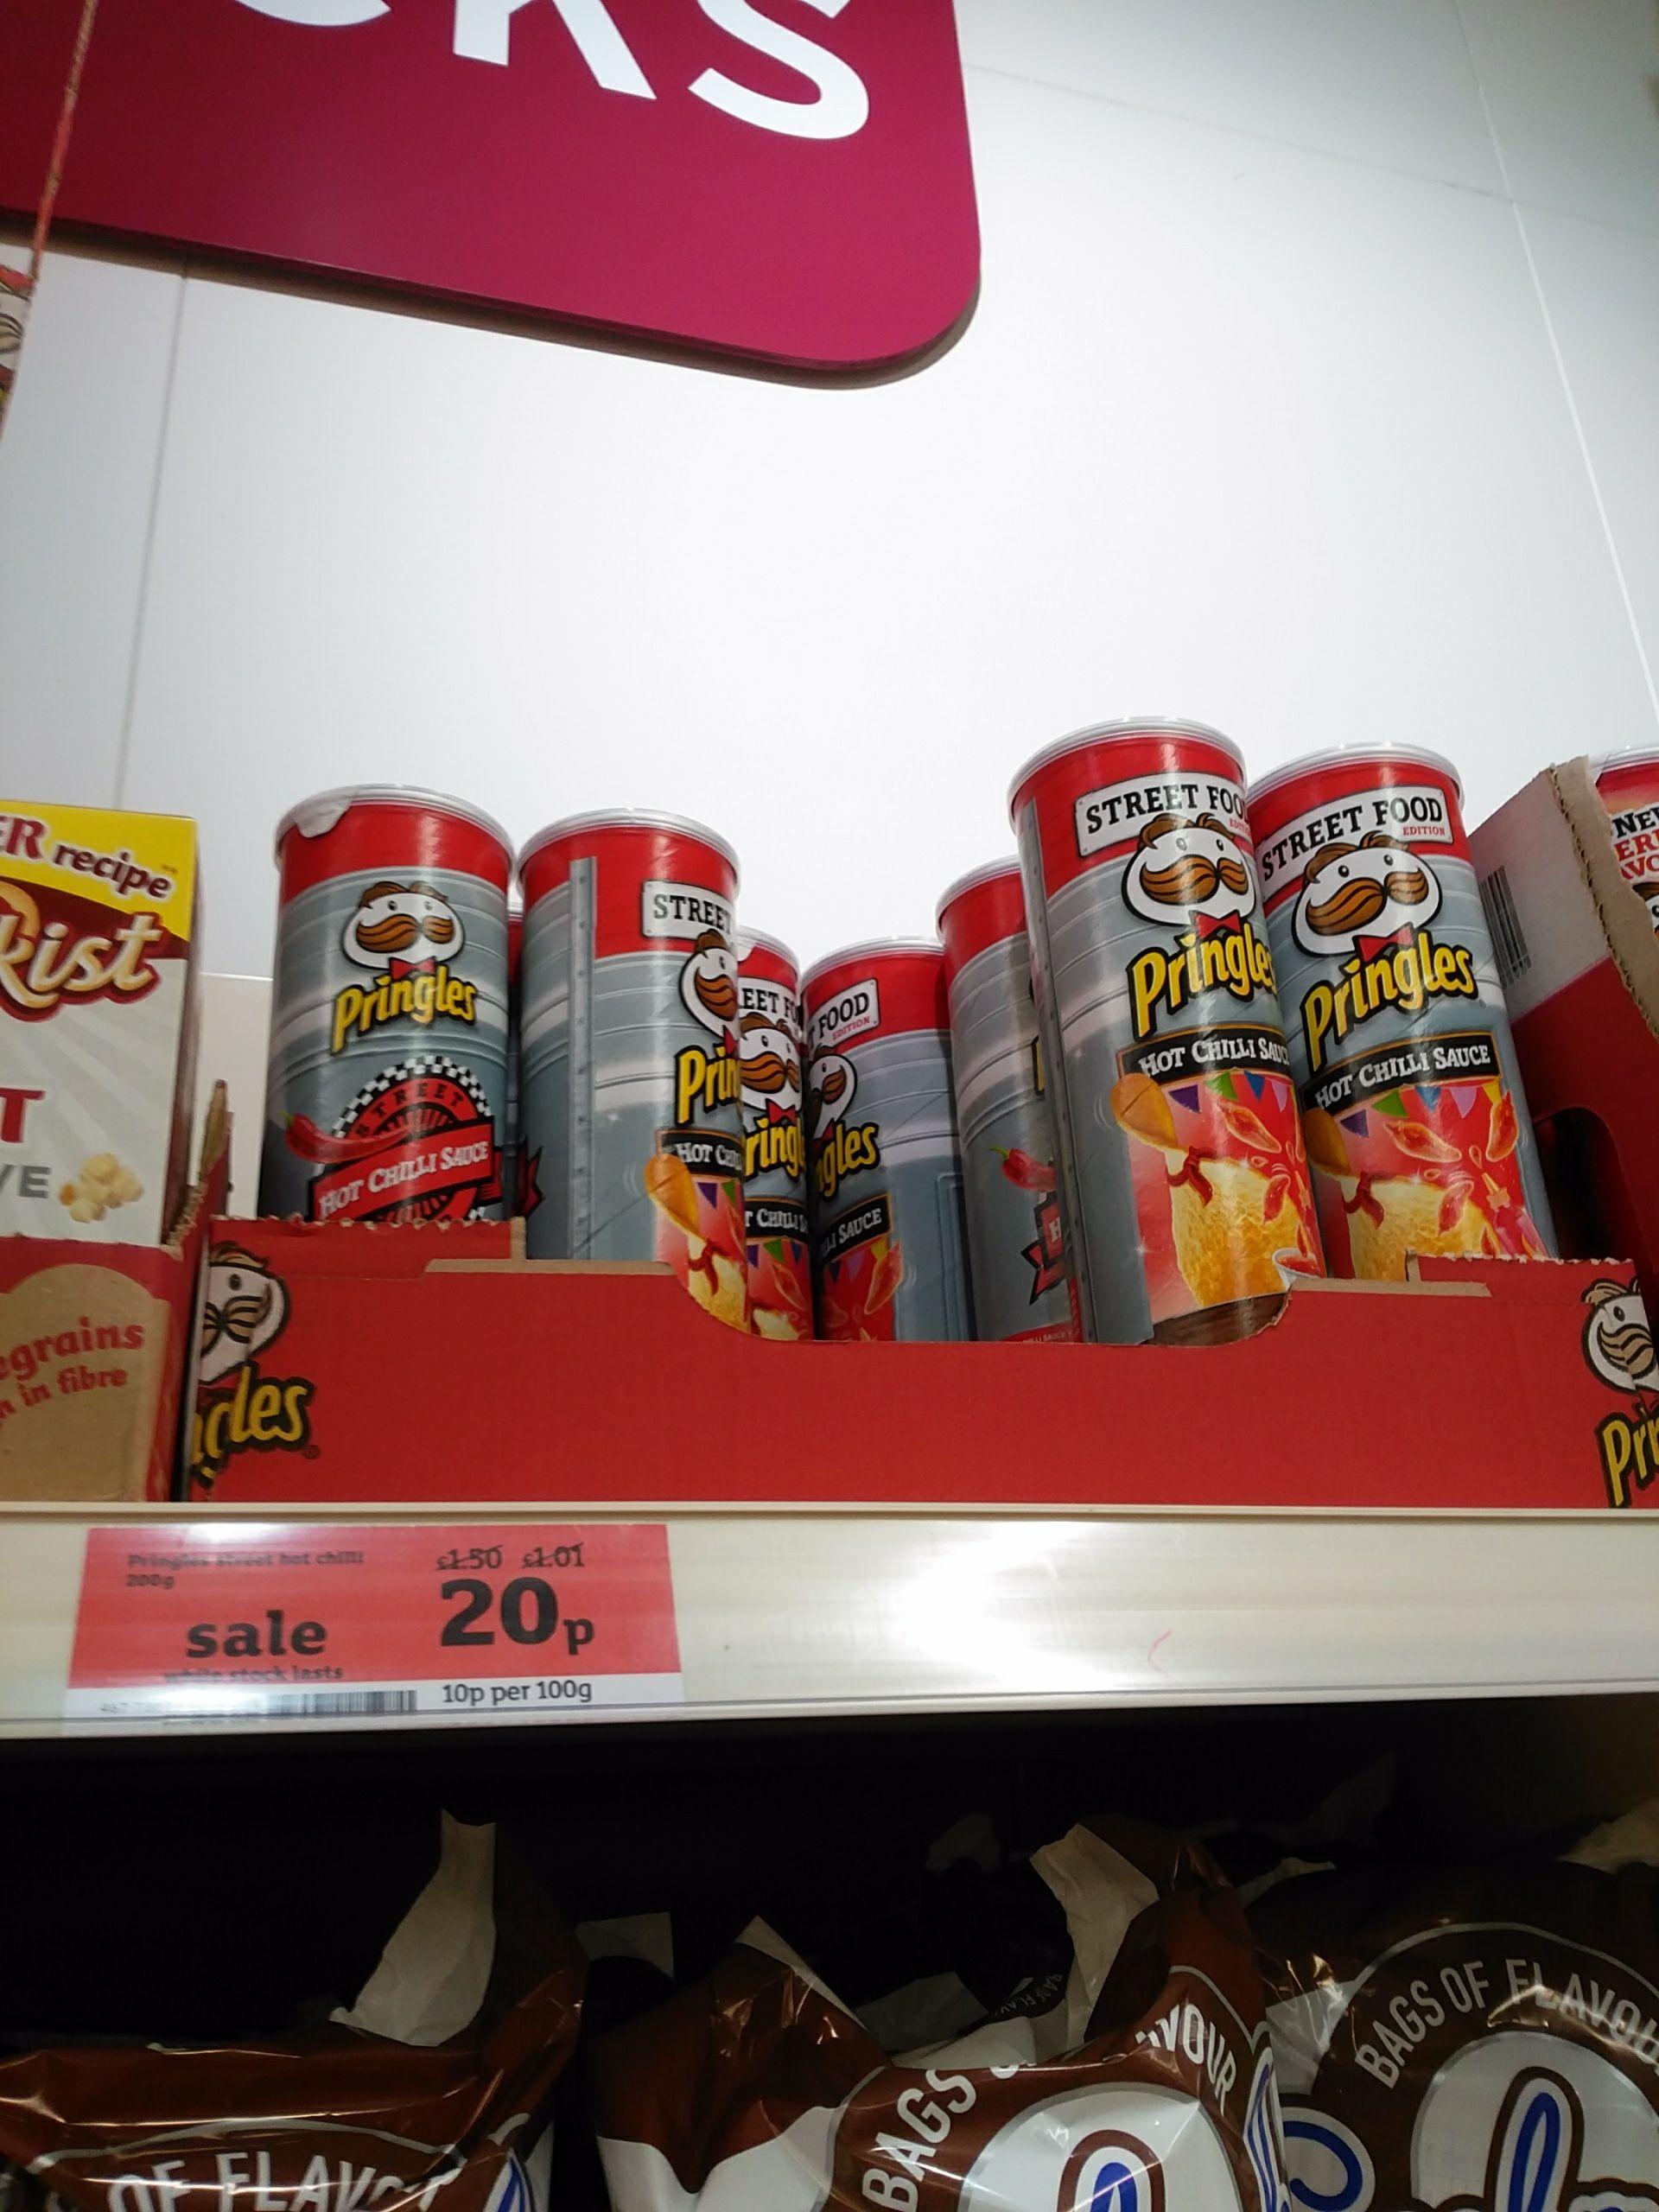 Pringles Hot Chilli Sauce flavour, 20p, Sainsbury's Saltburn